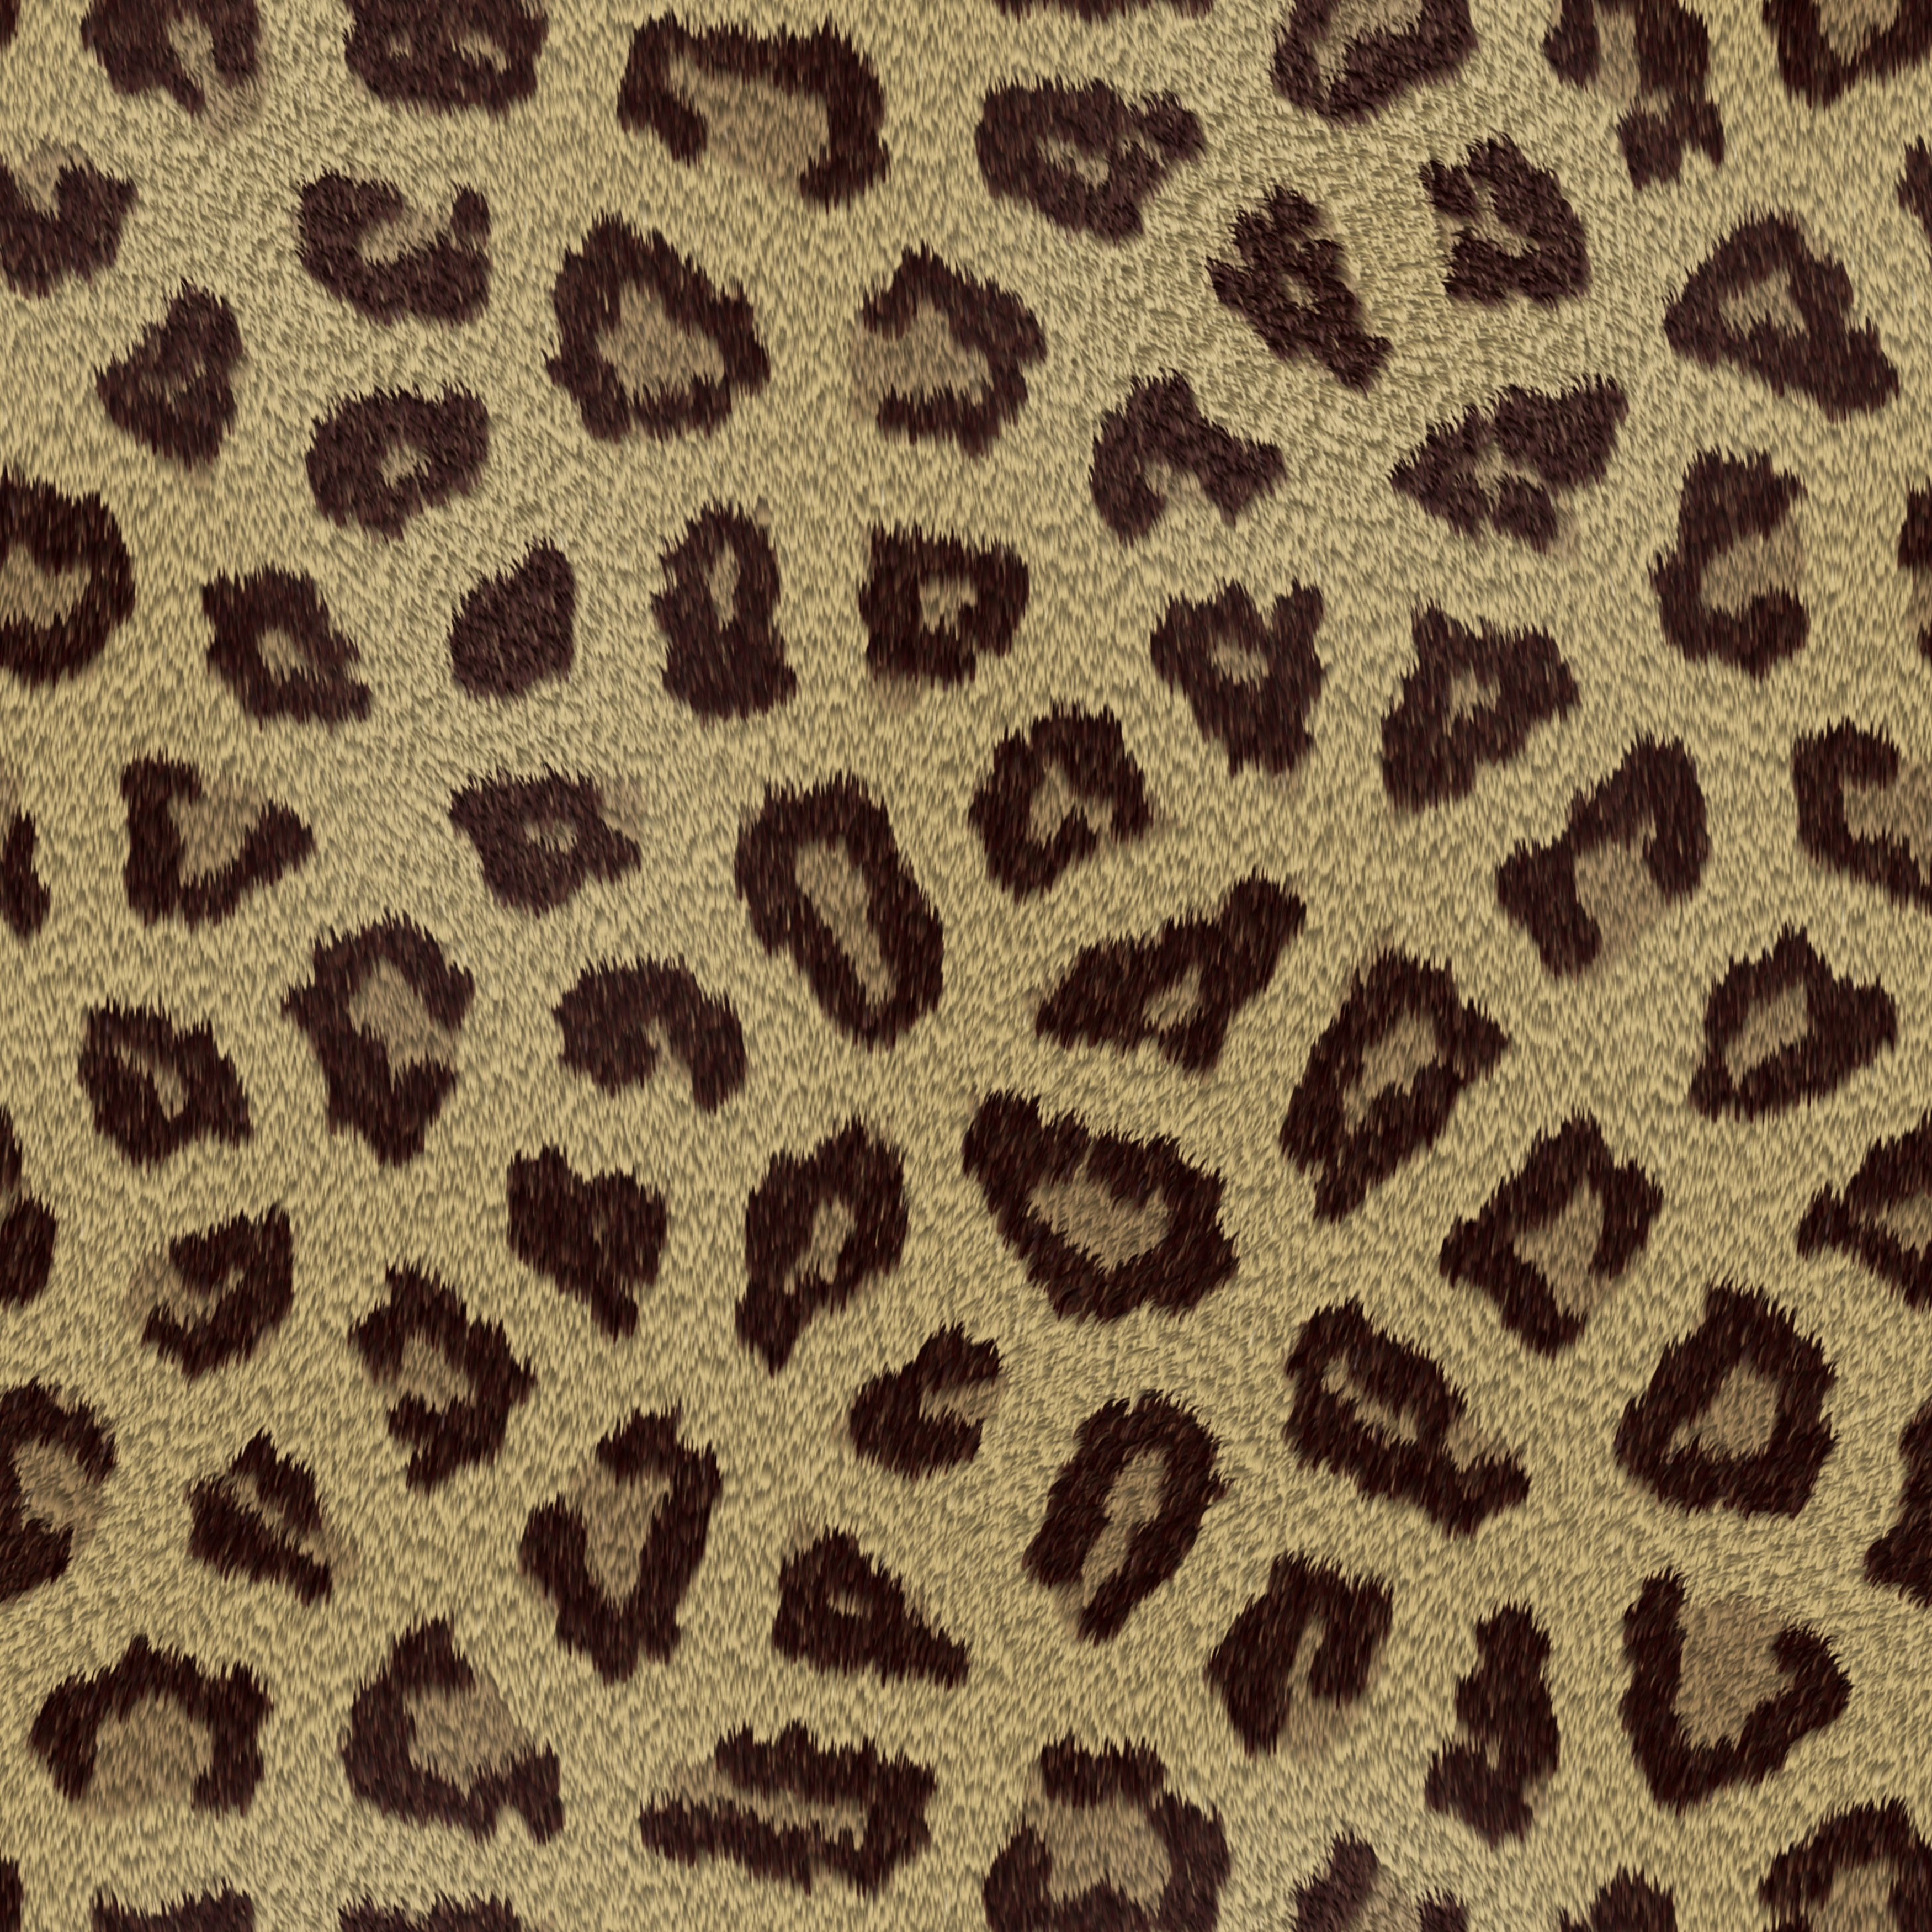 leopard texture background - seamless fur - http://www.myfreetextures.com/leopard-texture-background-seamless-fur/